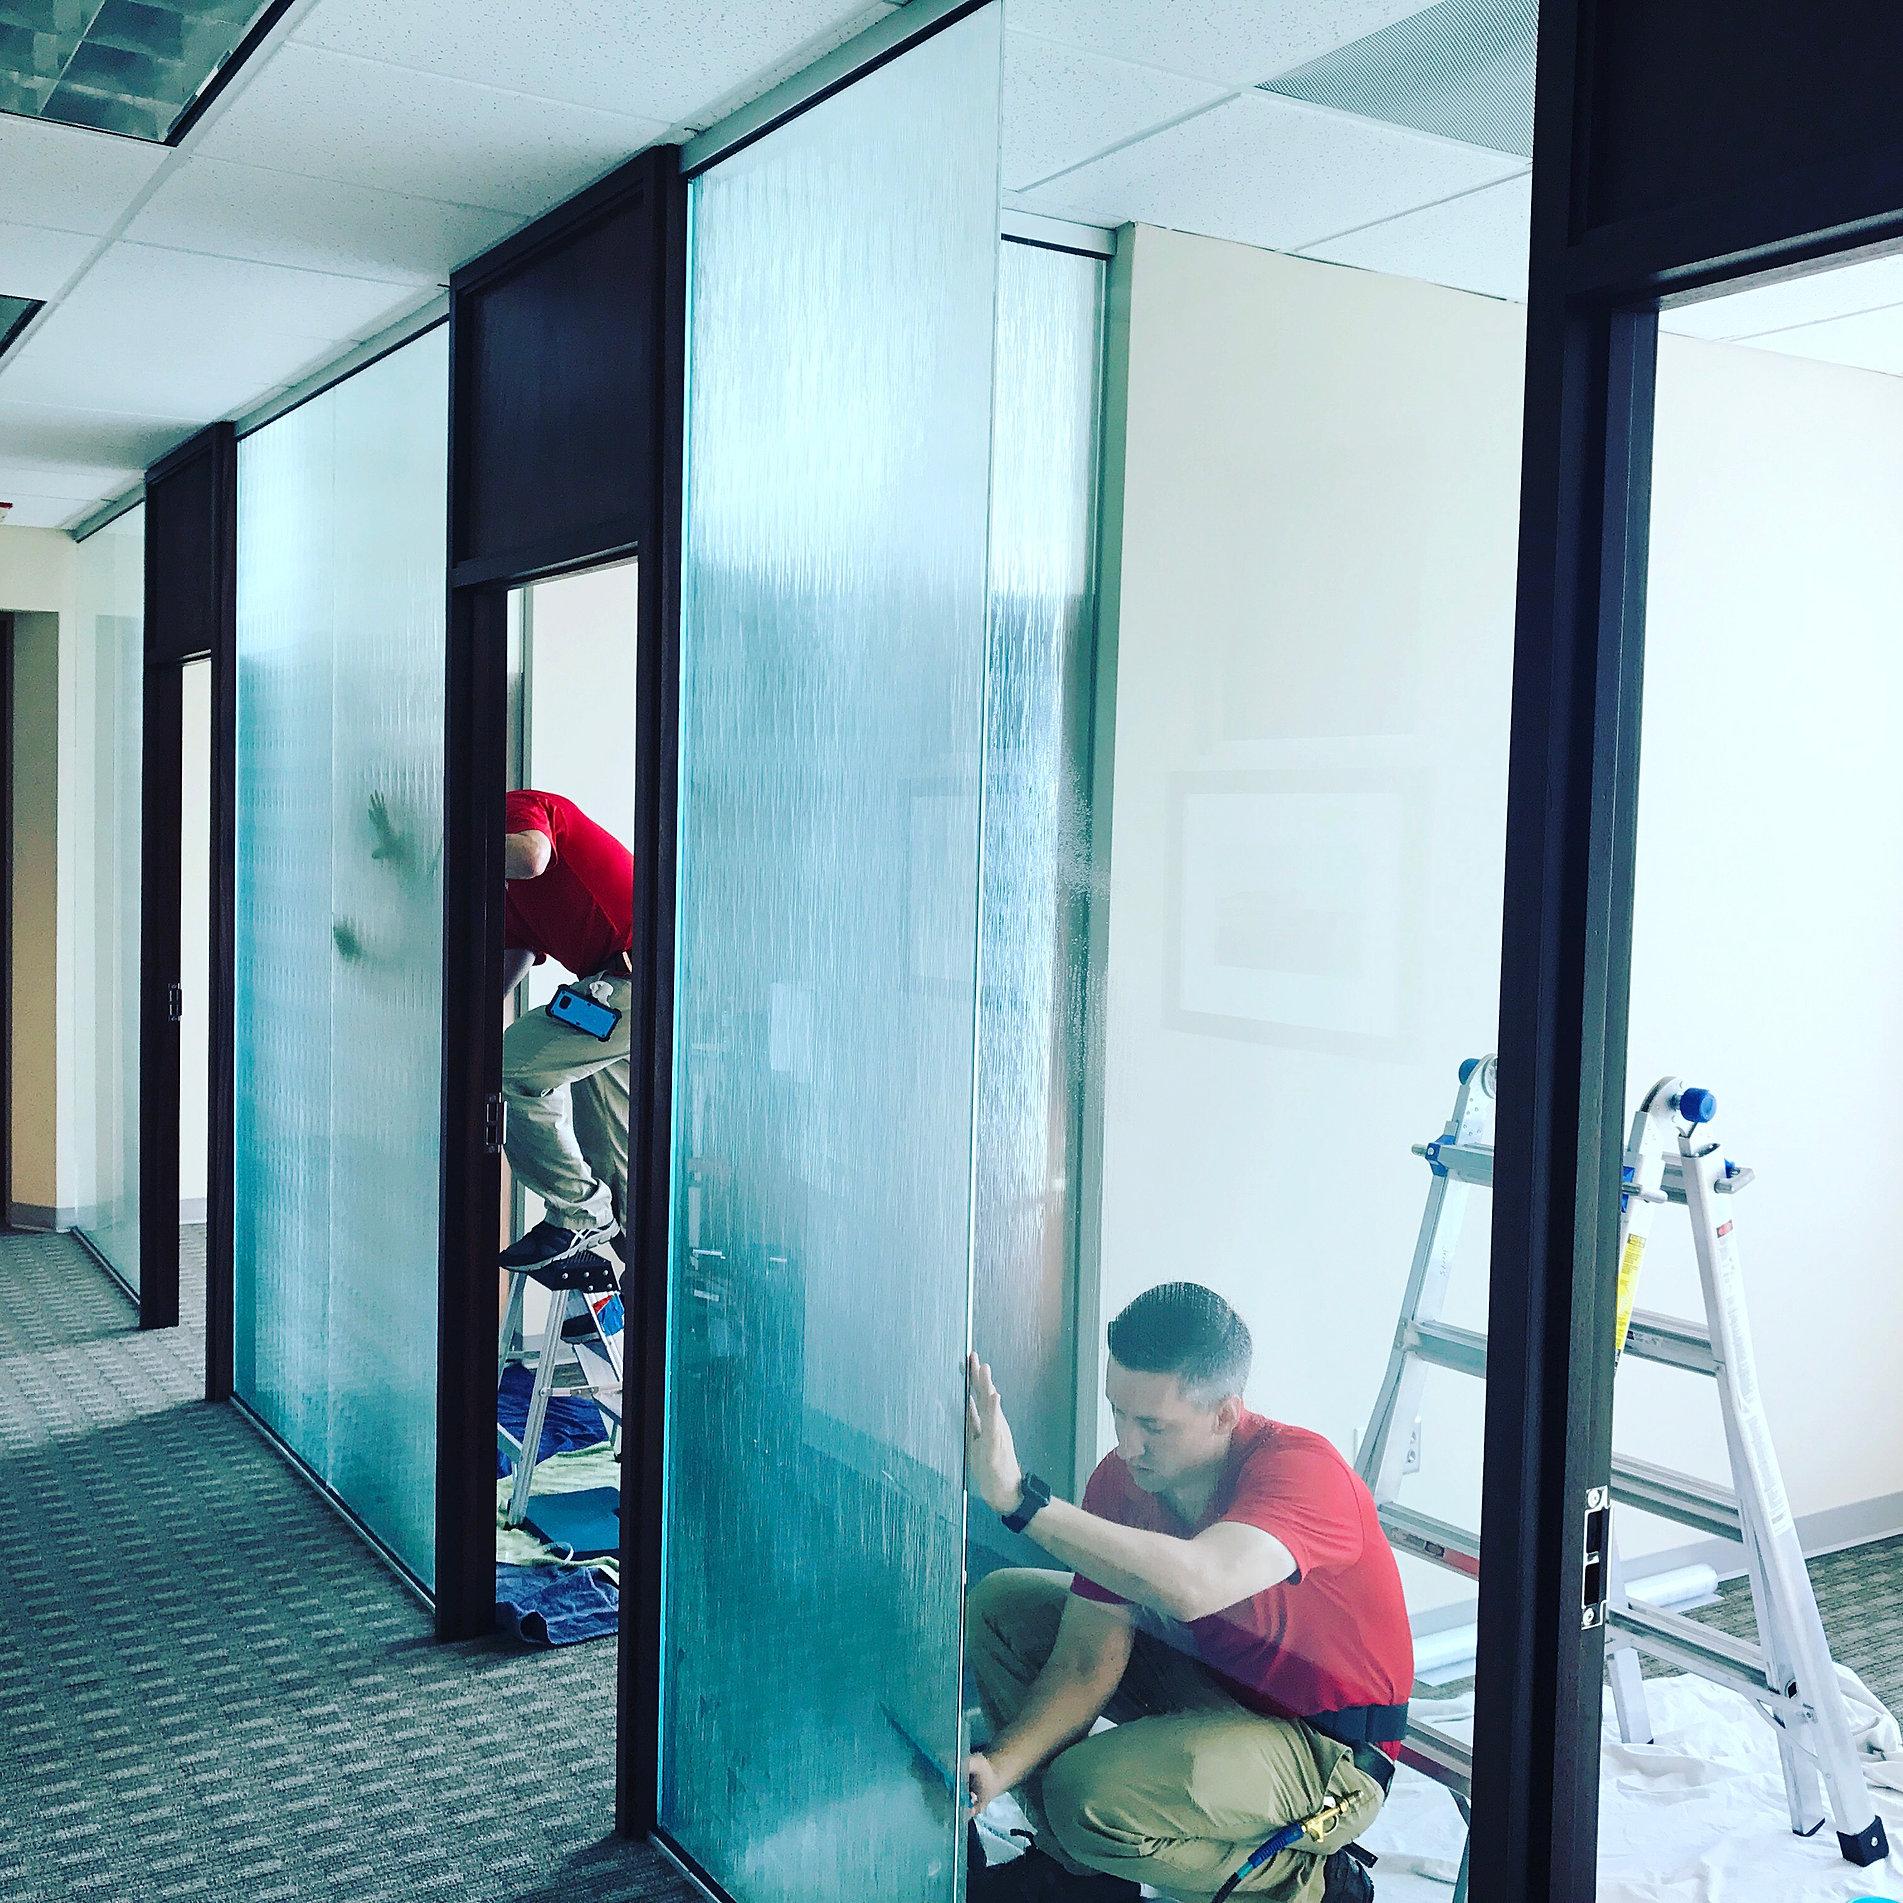 Decorative window tint & Naples Tint Co Floridau0027s #1 Source for Professional Window Tinting